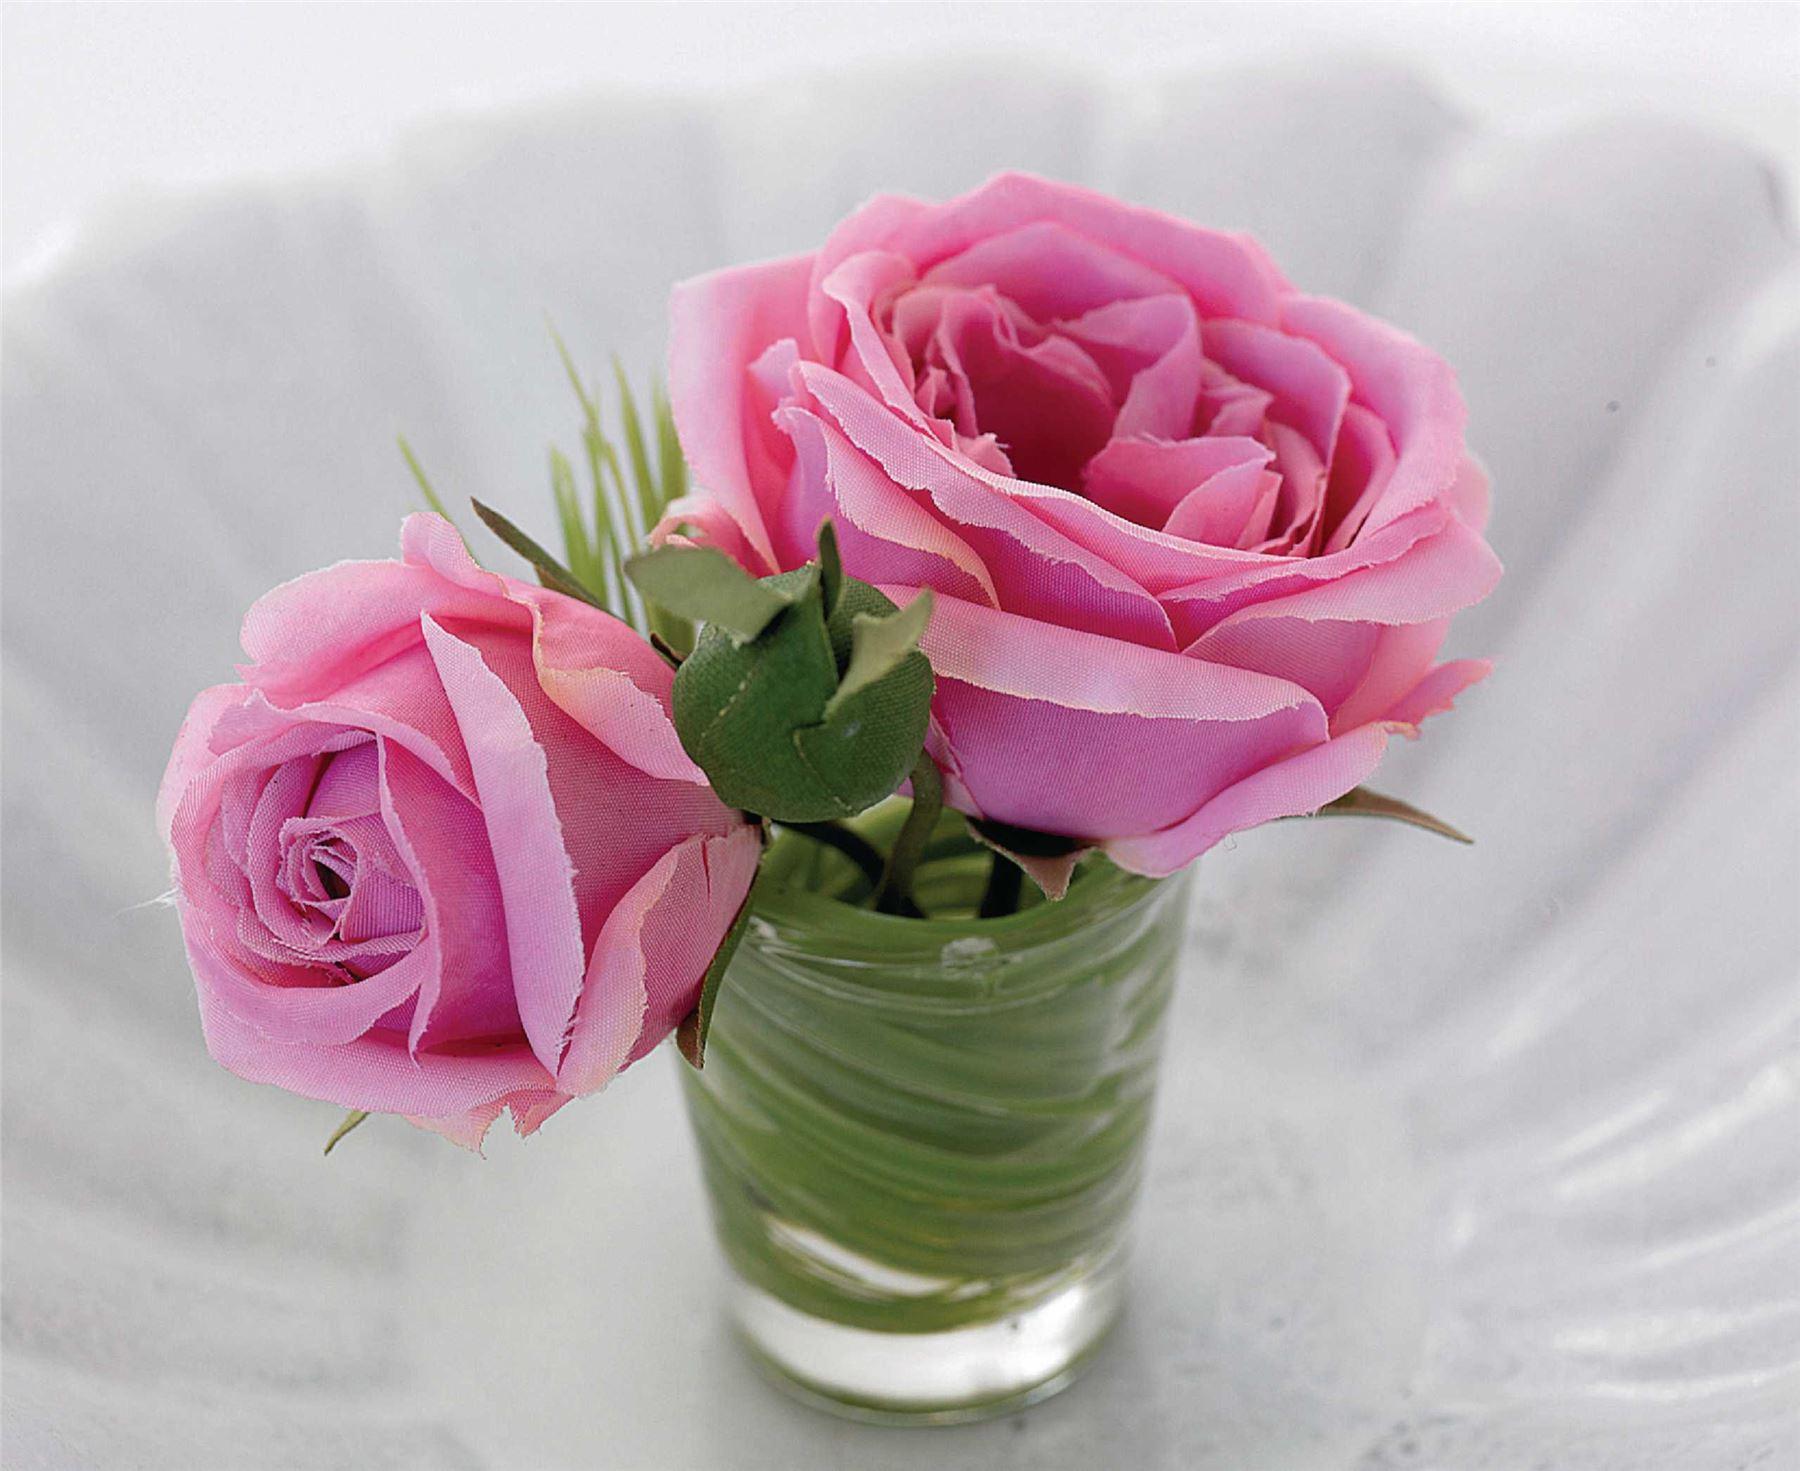 Bloomof The Month 12 Seasonal Designs Leaf-Lined Vase Artificial ...